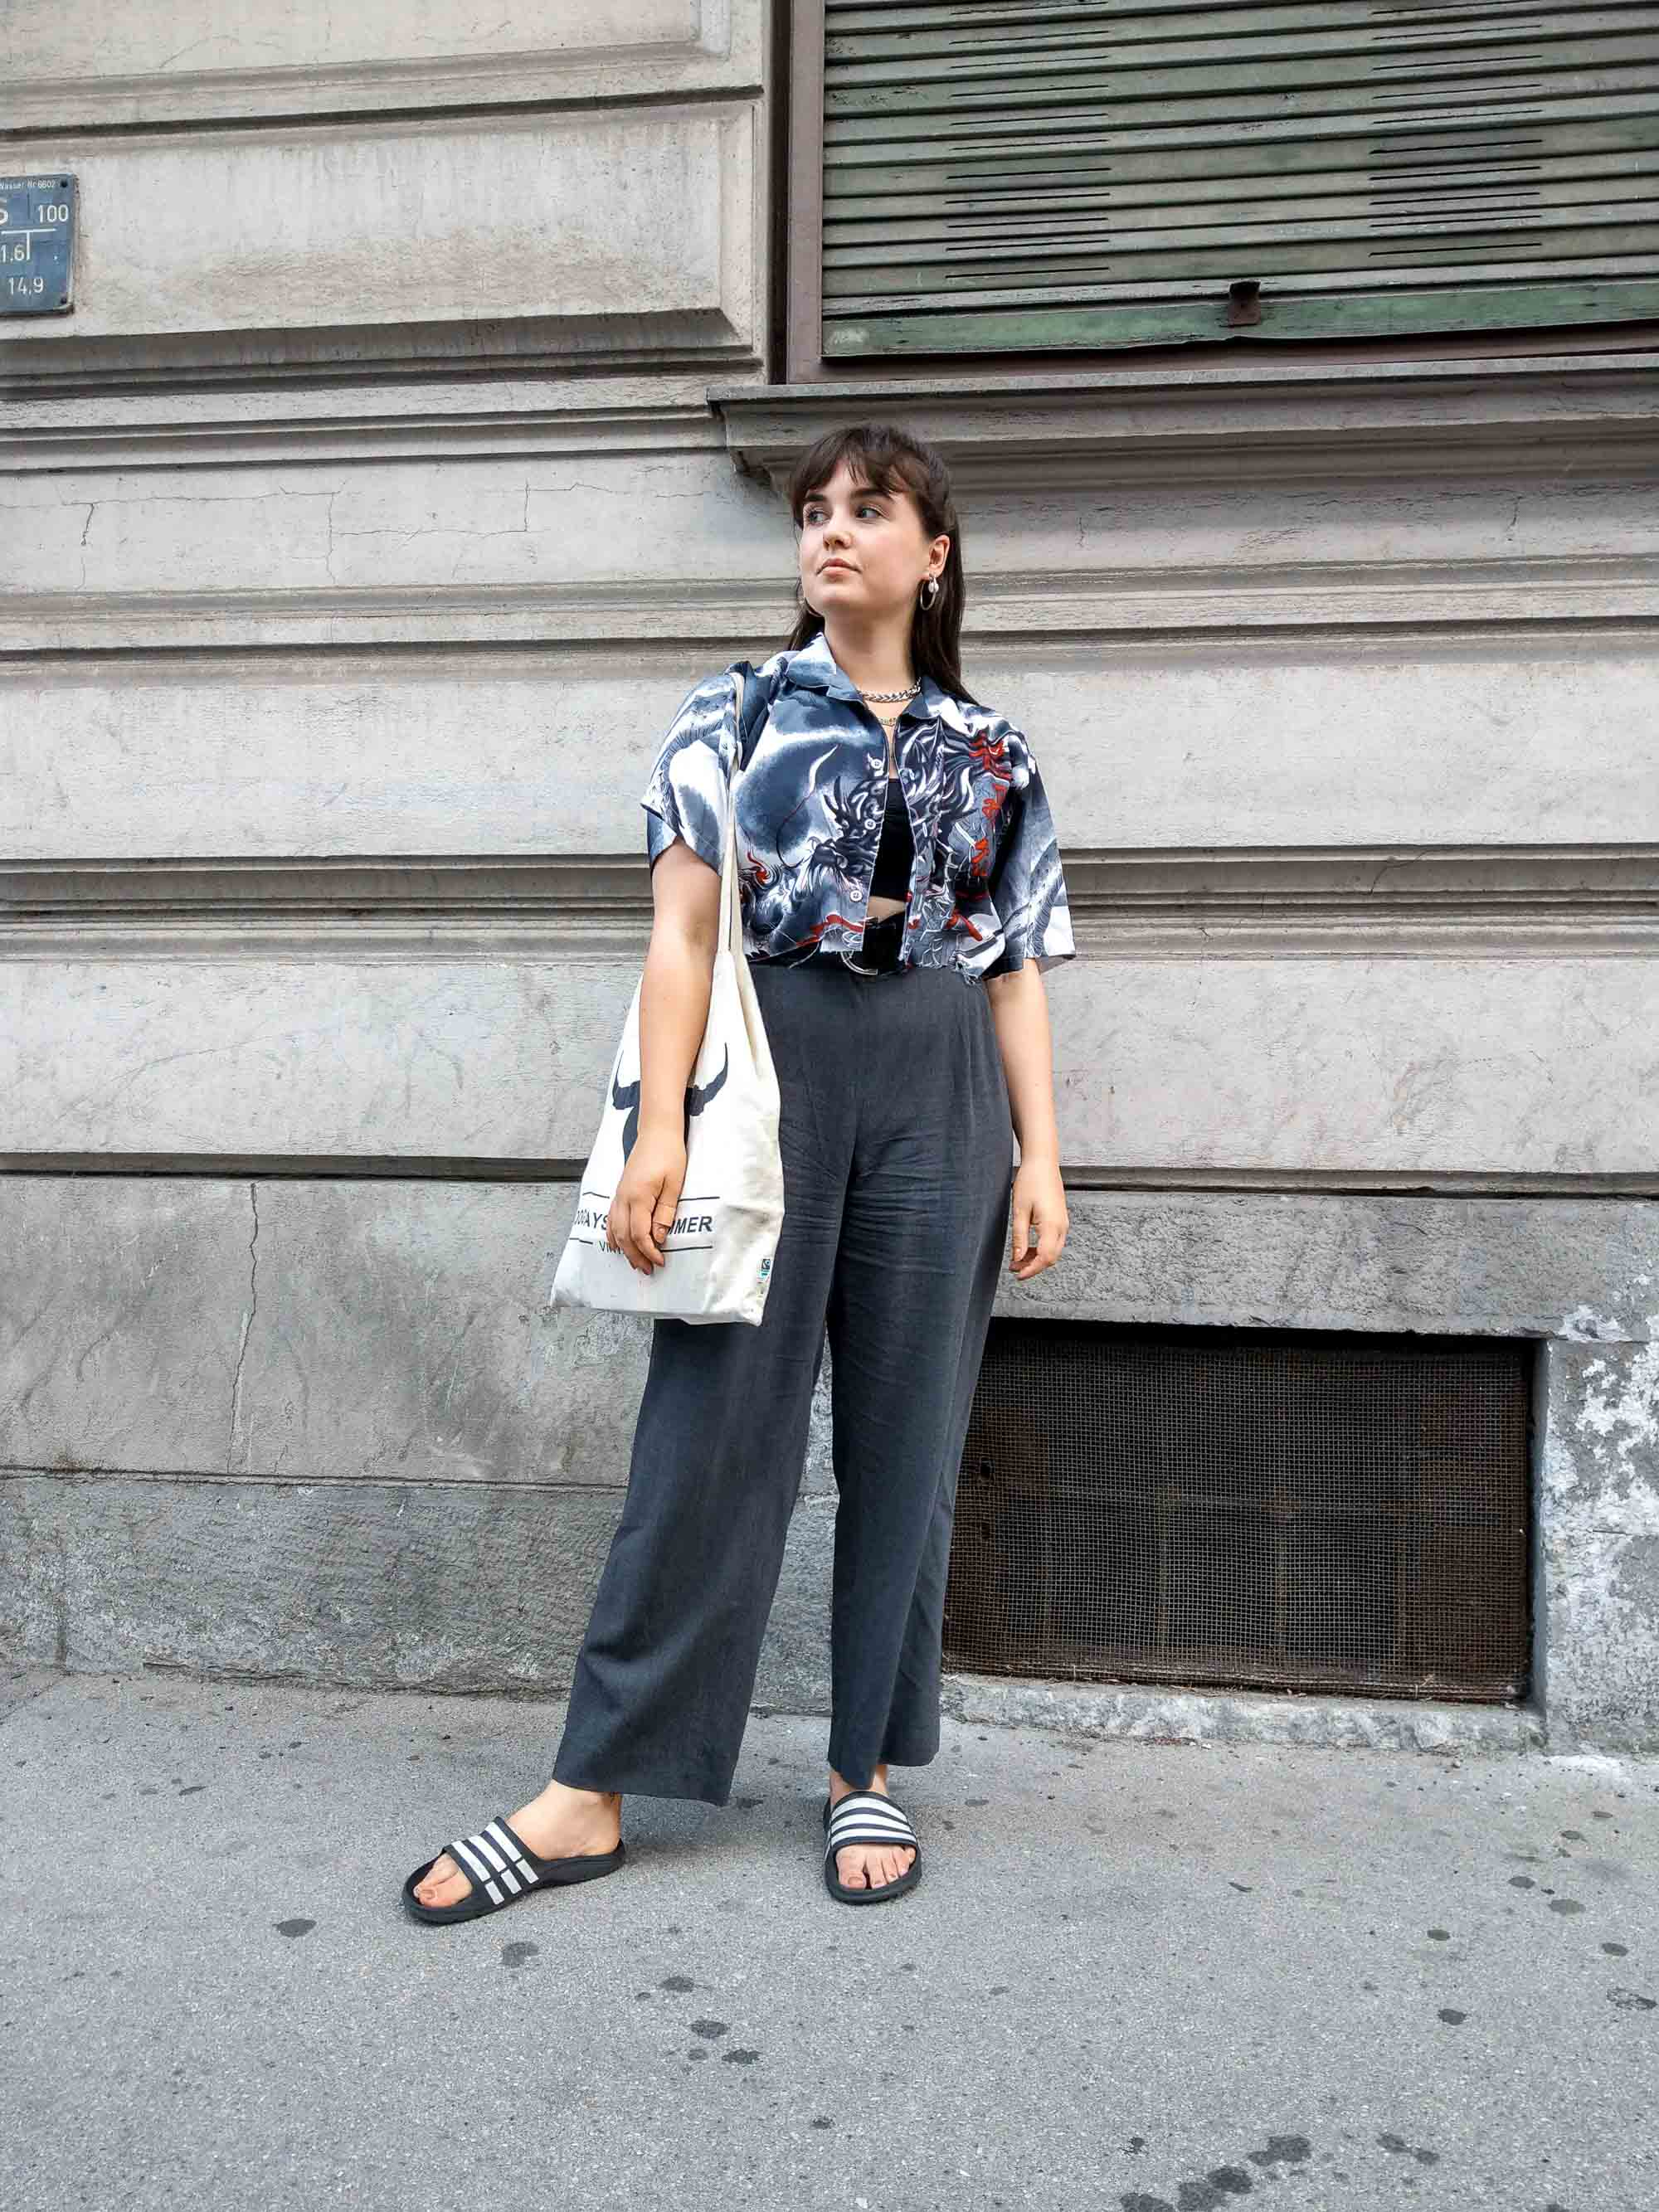 Clarissas Office Looks im Juli – Vintage Outfit Inspiration mit gecropptem Hemd